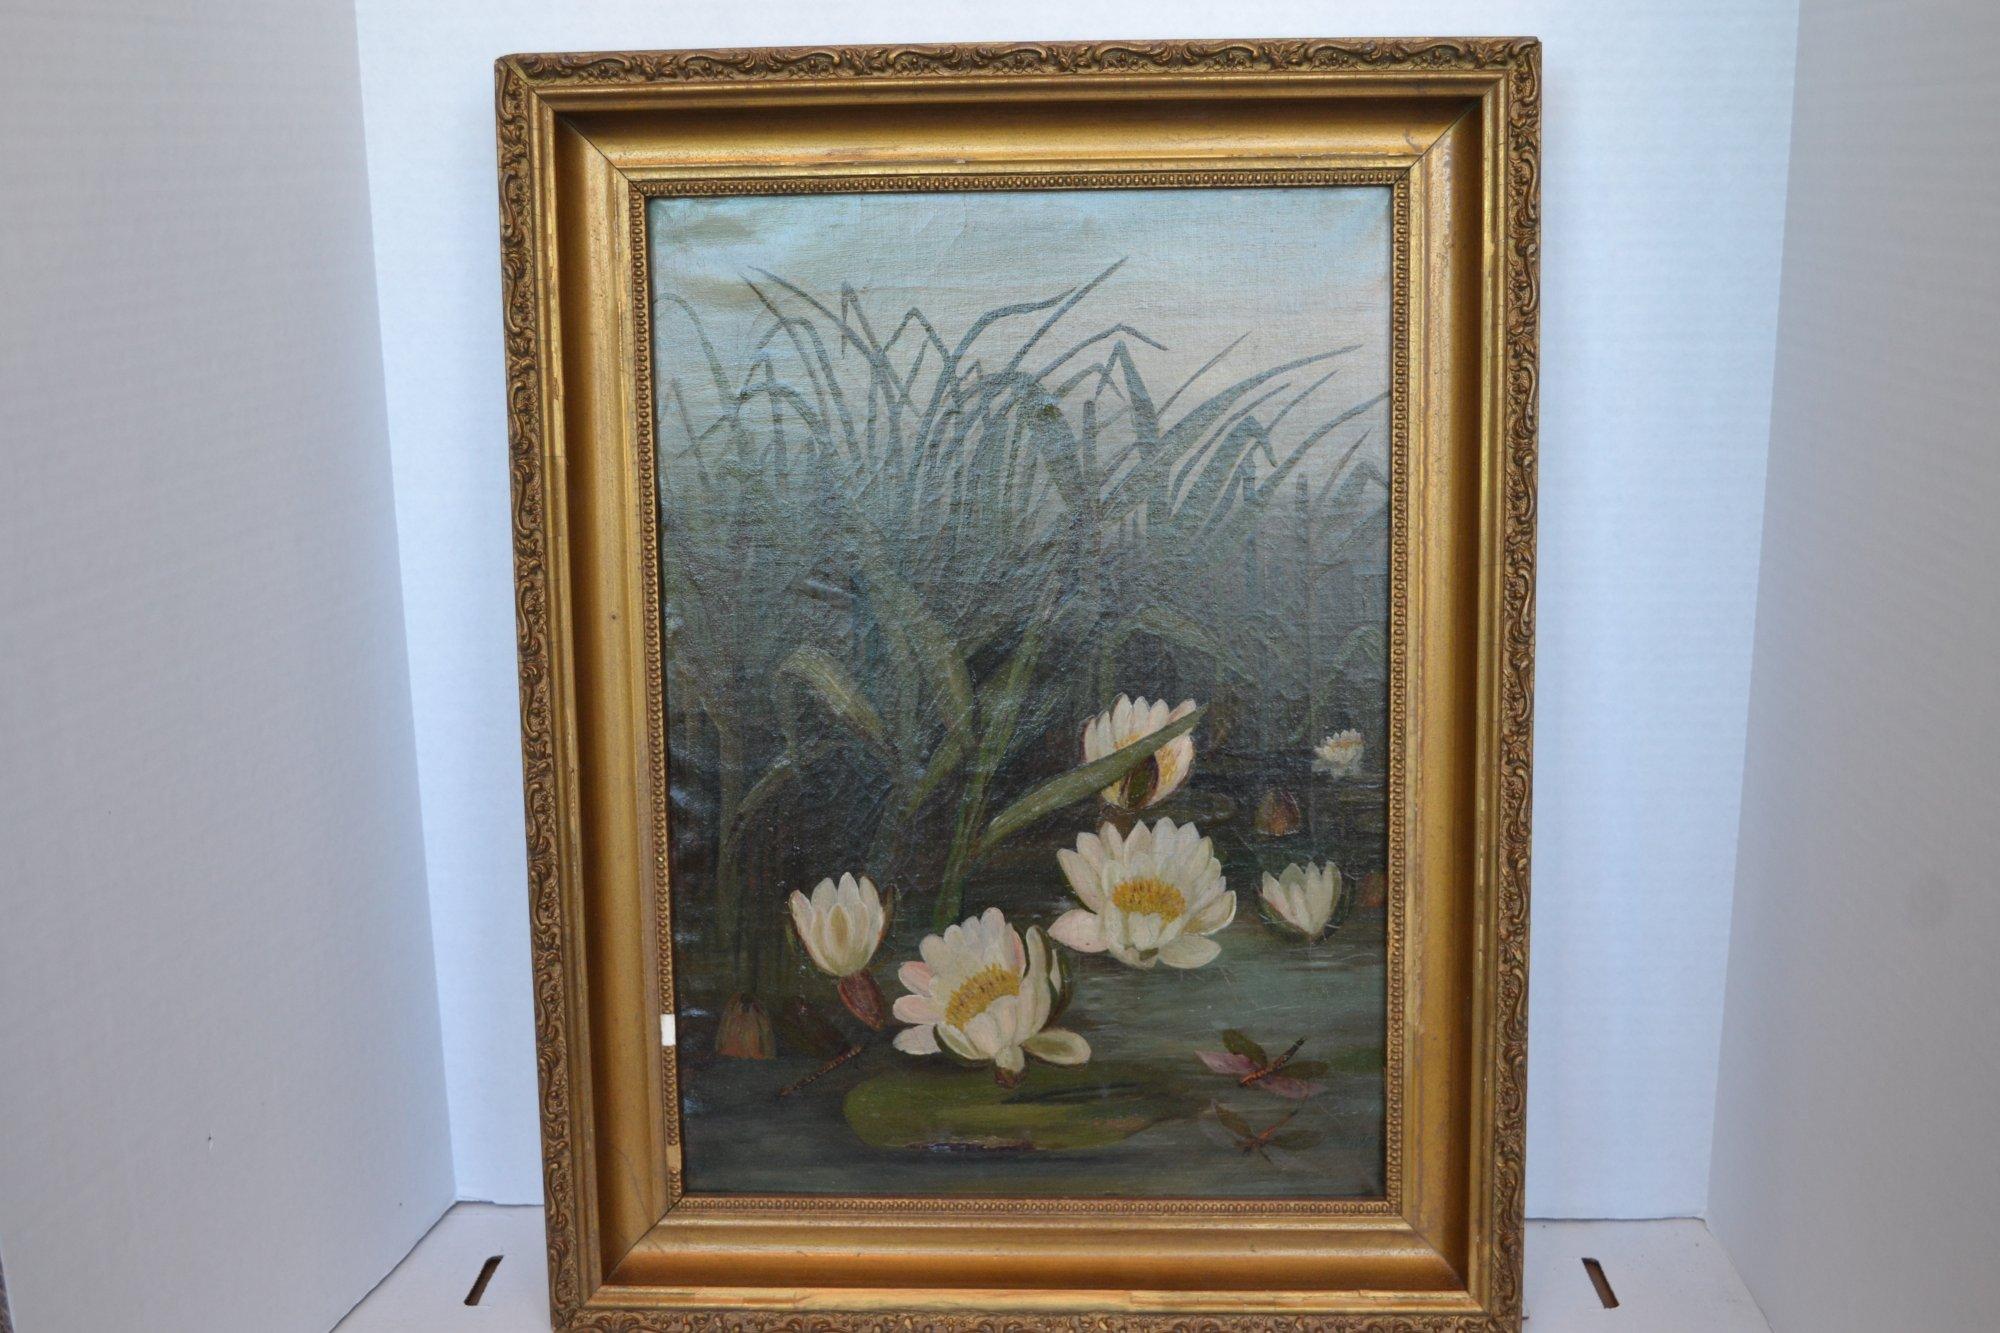 20th century chinese marsh painting w lotus leaves and white lotus 20th century chinese marsh painting w lotus leaves and white lotus flowers oil on canvas gold mightylinksfo